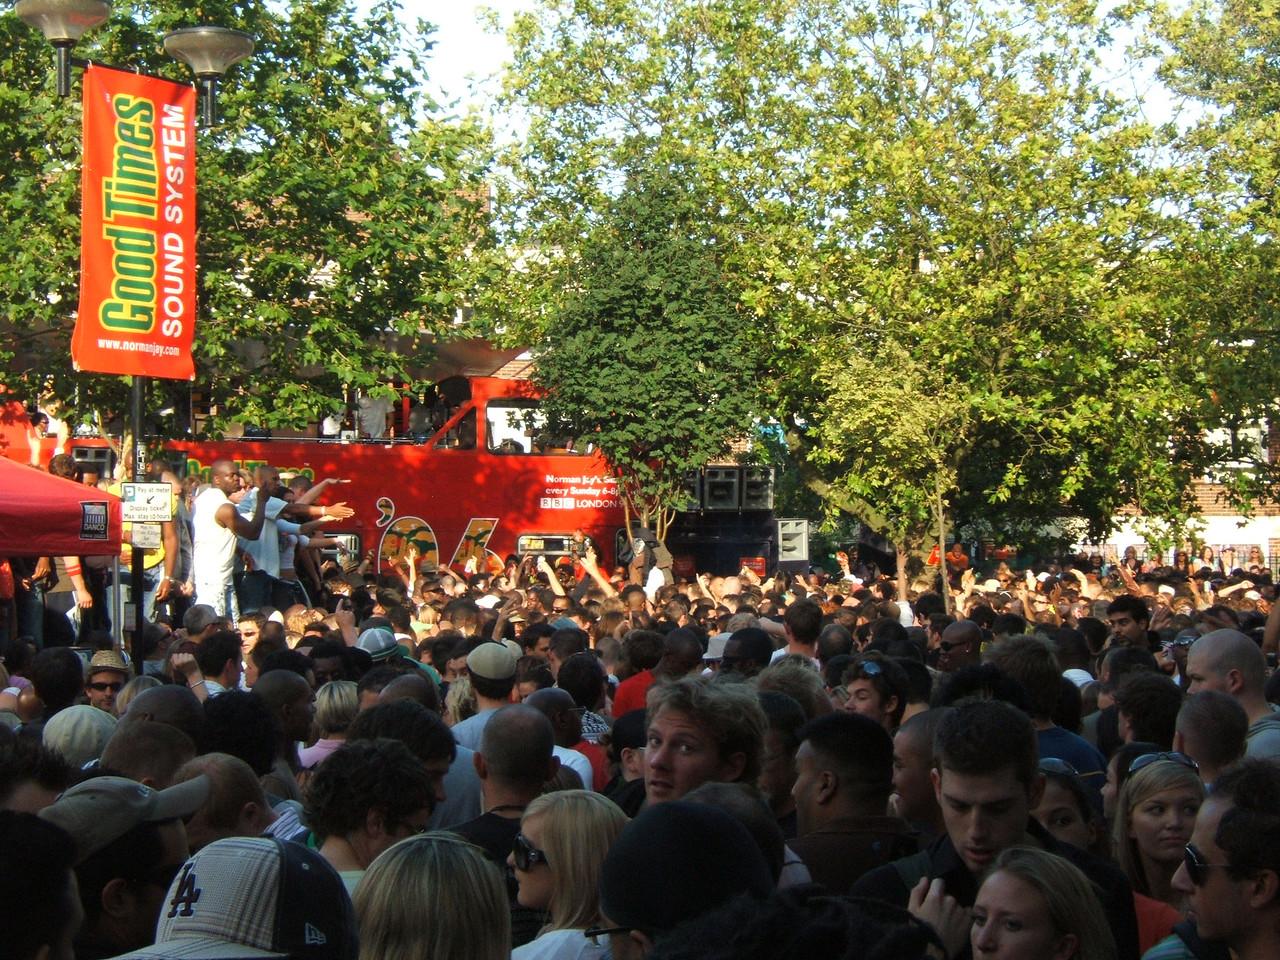 Notting Hill Carnival 2006